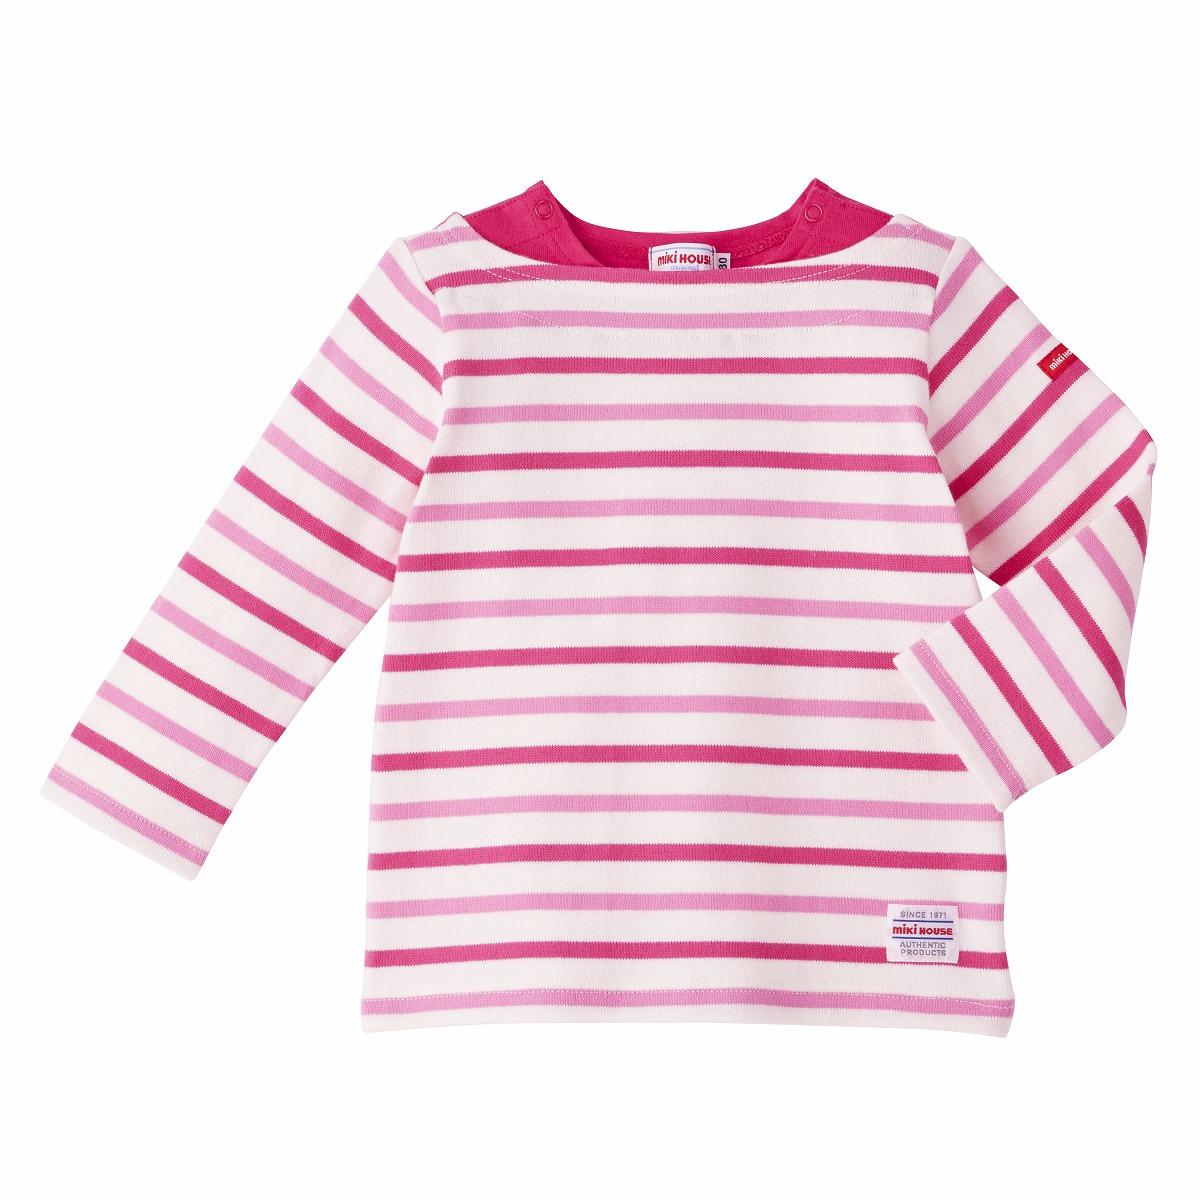 Everyday MIKIHOUSE 经典彩色条纹针织长袖T恤衫(2色)